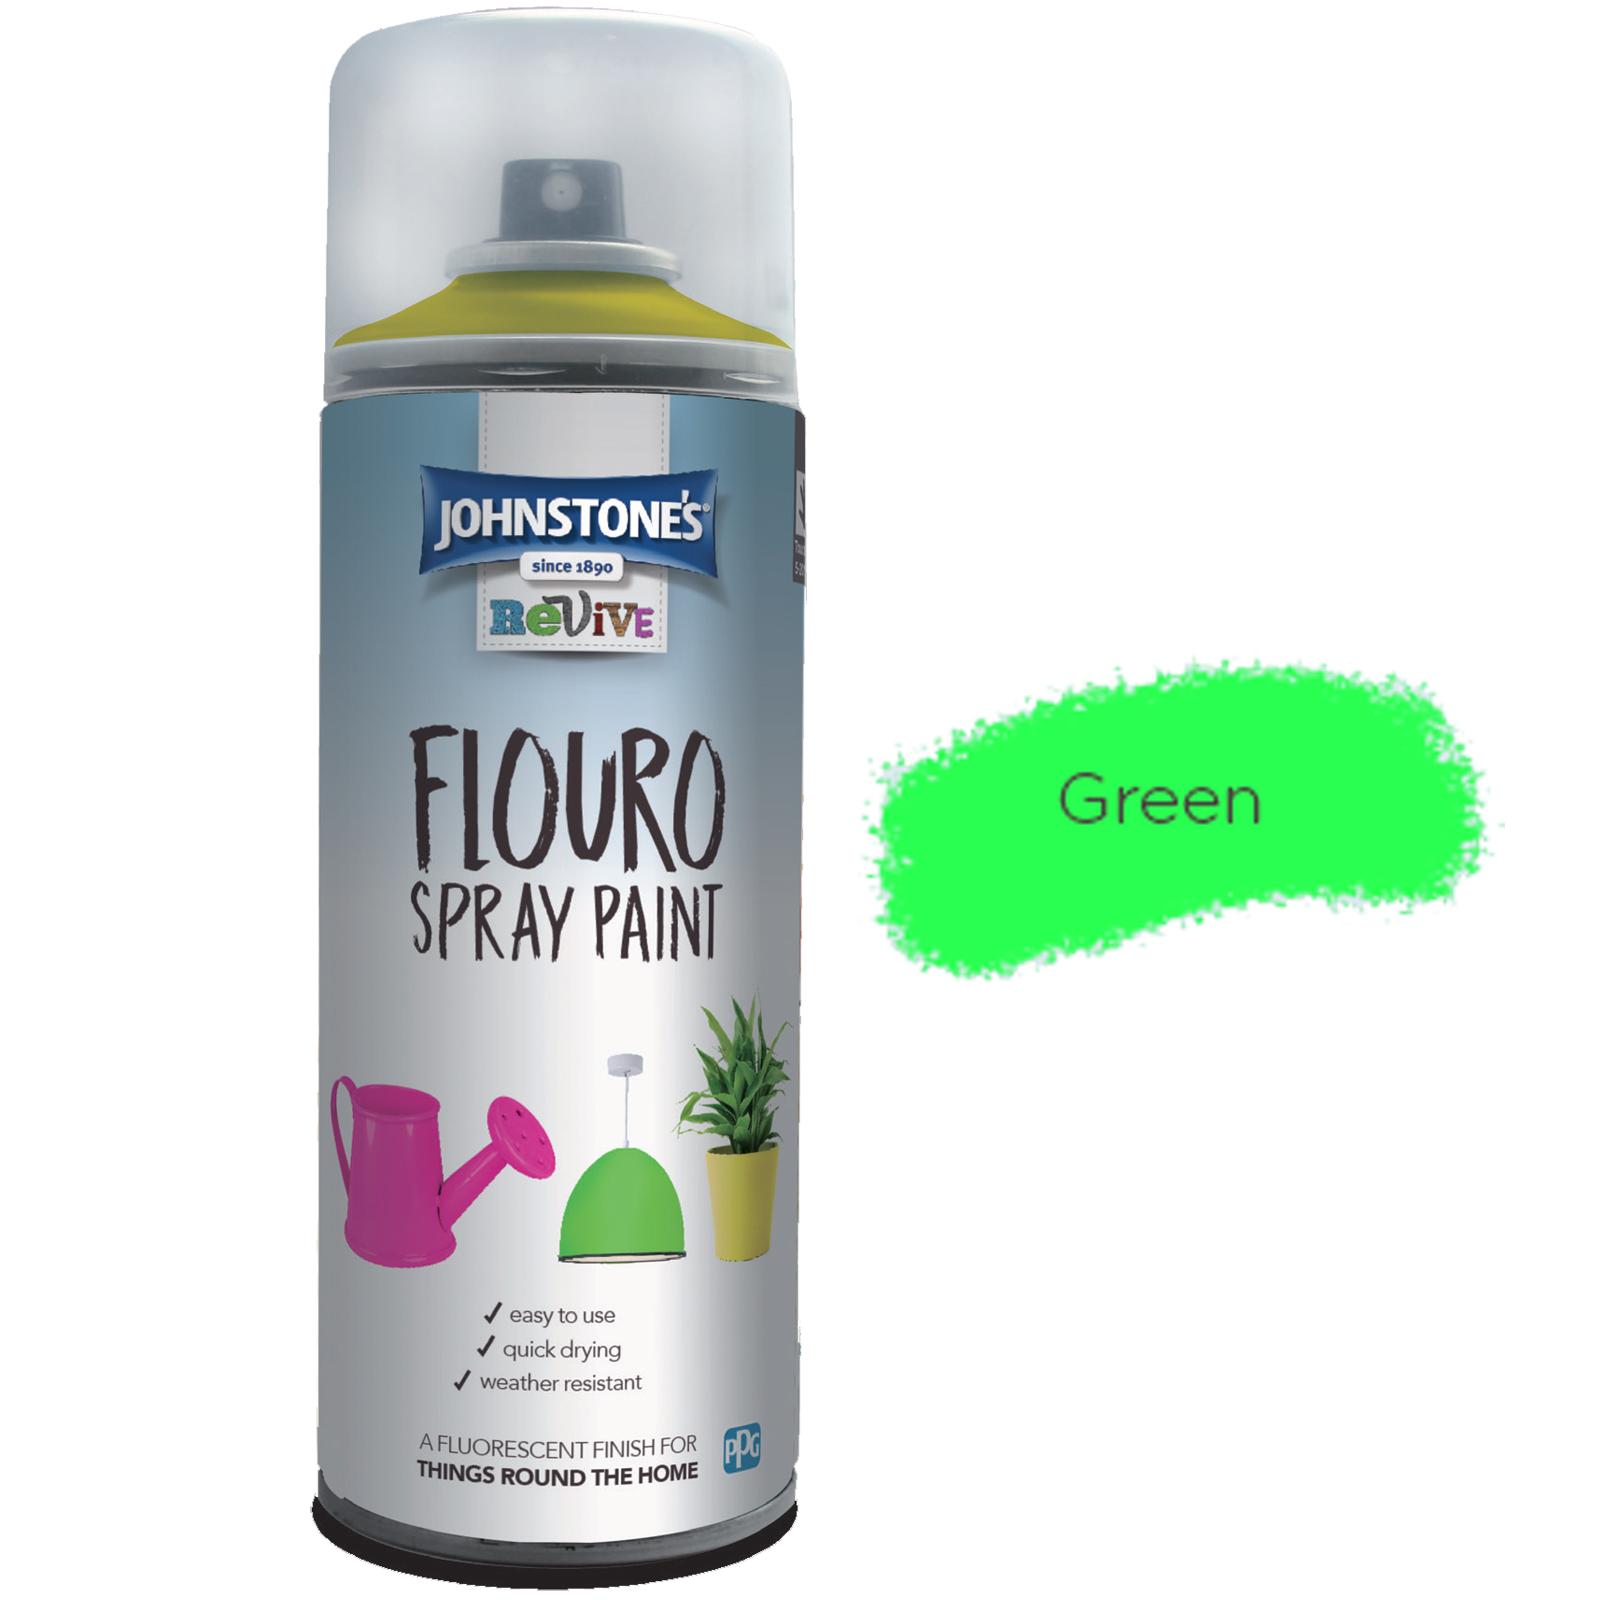 FLOURO SPRAY PAINT GREEN